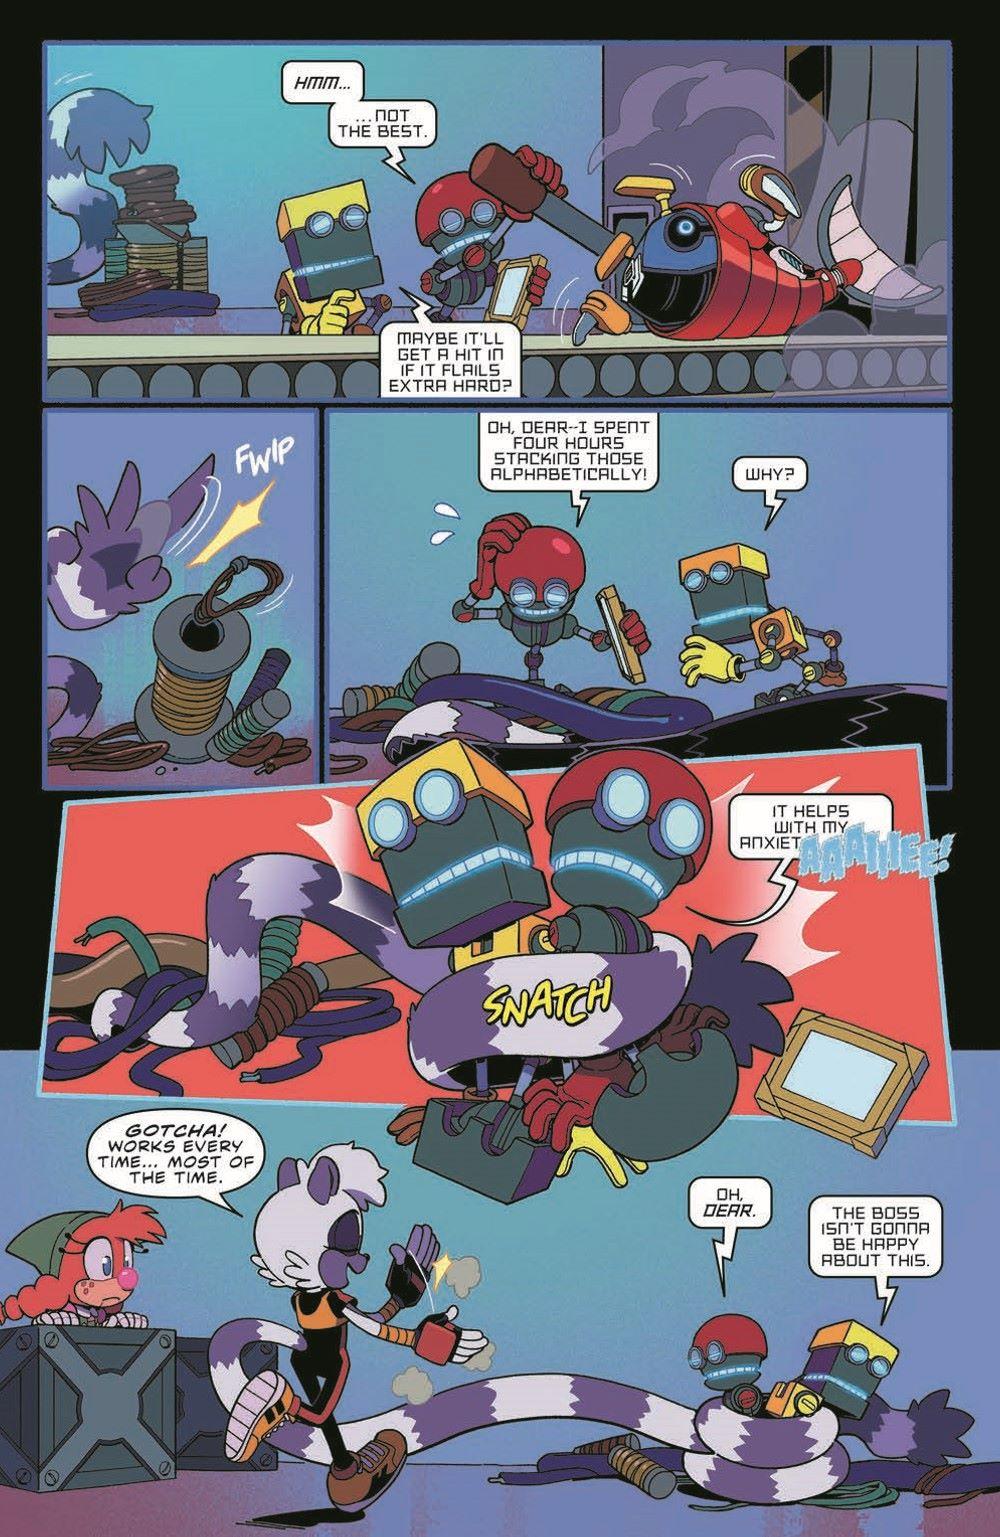 STH39_pr-5 ComicList Previews: SONIC THE HEDGEHOG #39